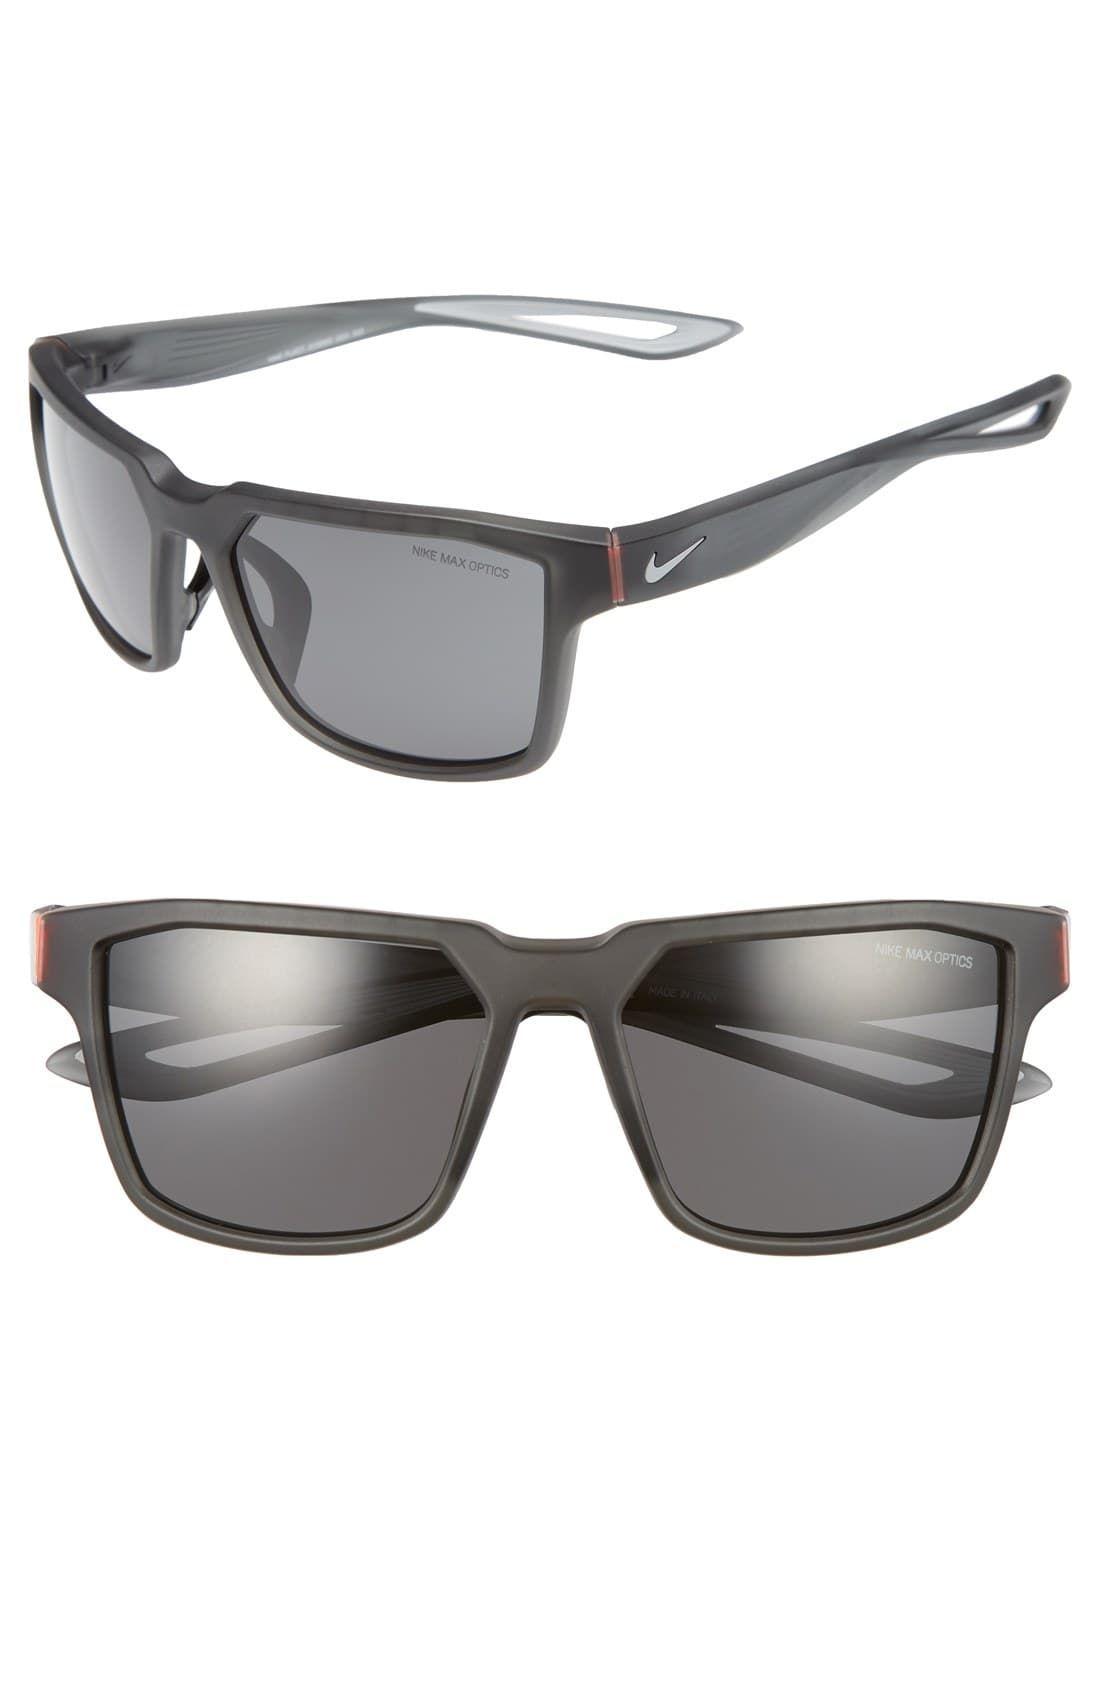 Nike Fleet 55mm Sport Sunglasses Sports sunglasses